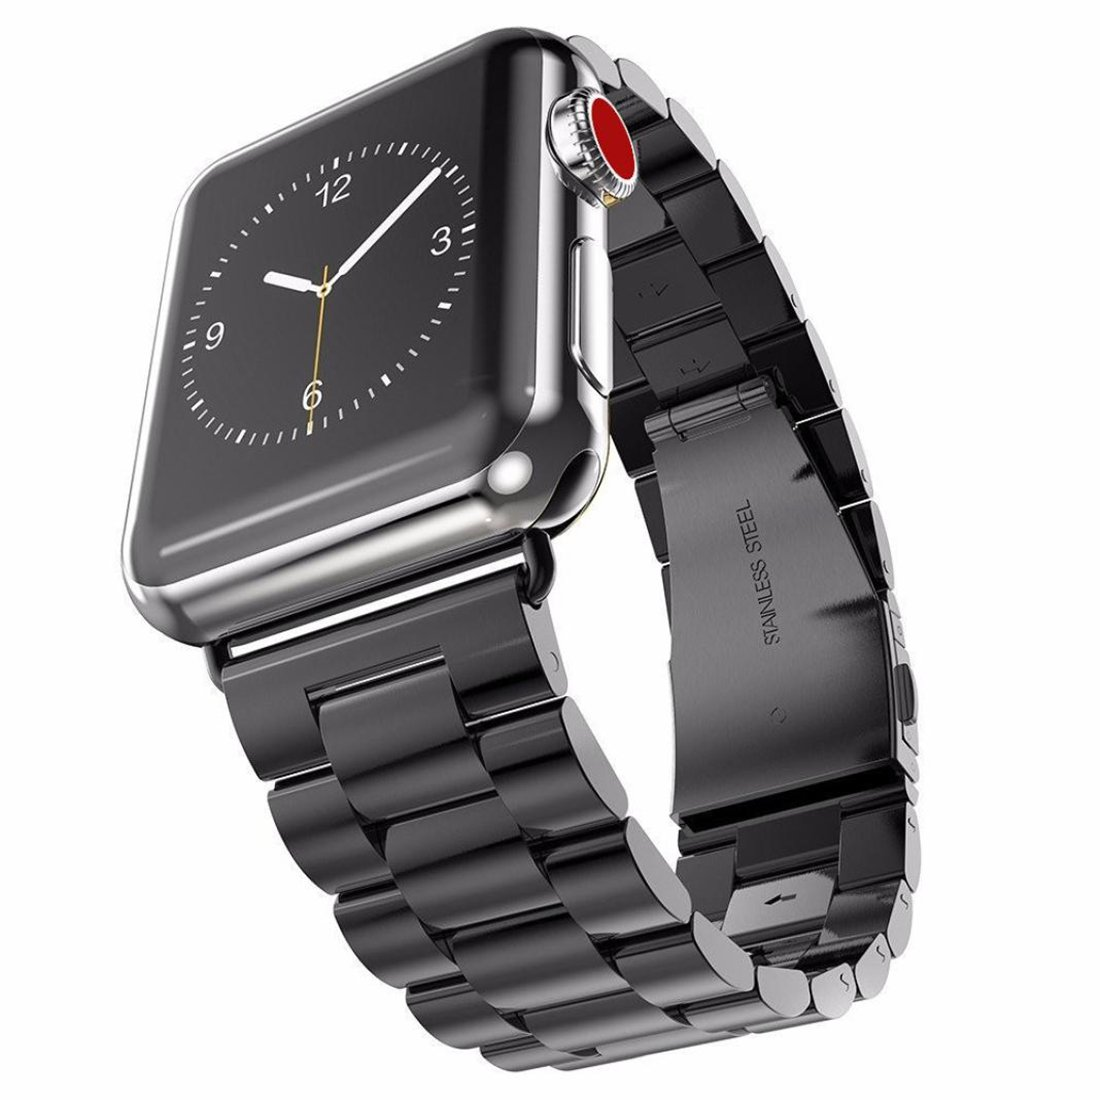 Apple Watchバンド、Hanyi Luxuryステンレススチール時計バンド交換用ストラップfor Apple I Watchシリーズ3 42 MM|Black Stainless Steel Black Stainless Steel 42 MM B076P6MLBY